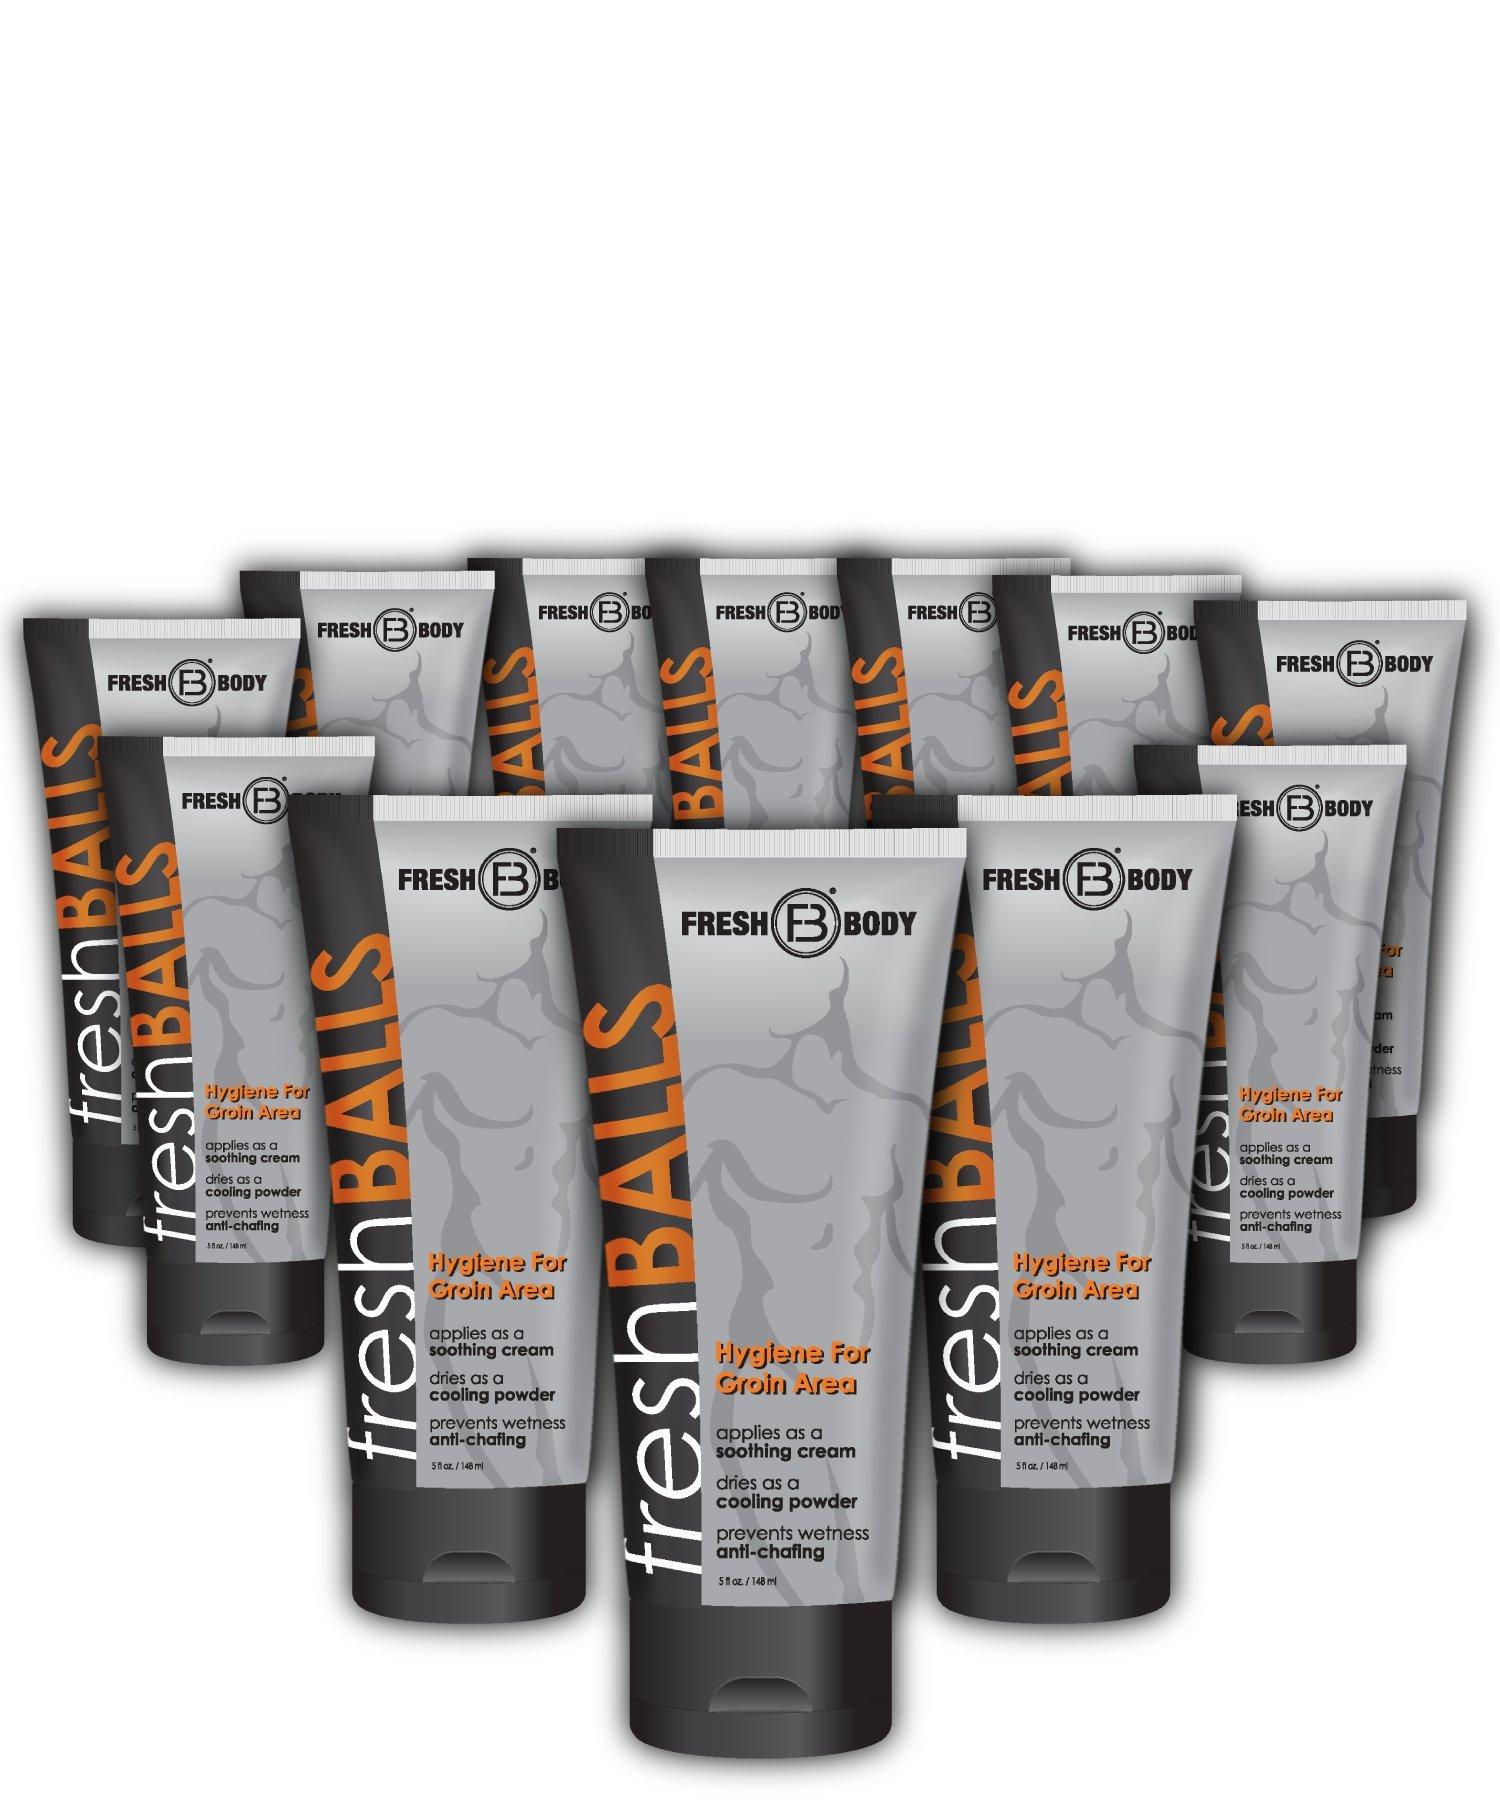 FRESH BALLS Special 12 PACK Male Hygiene Antiperspirant Lotion 3.4 oz by Fresh Body FB